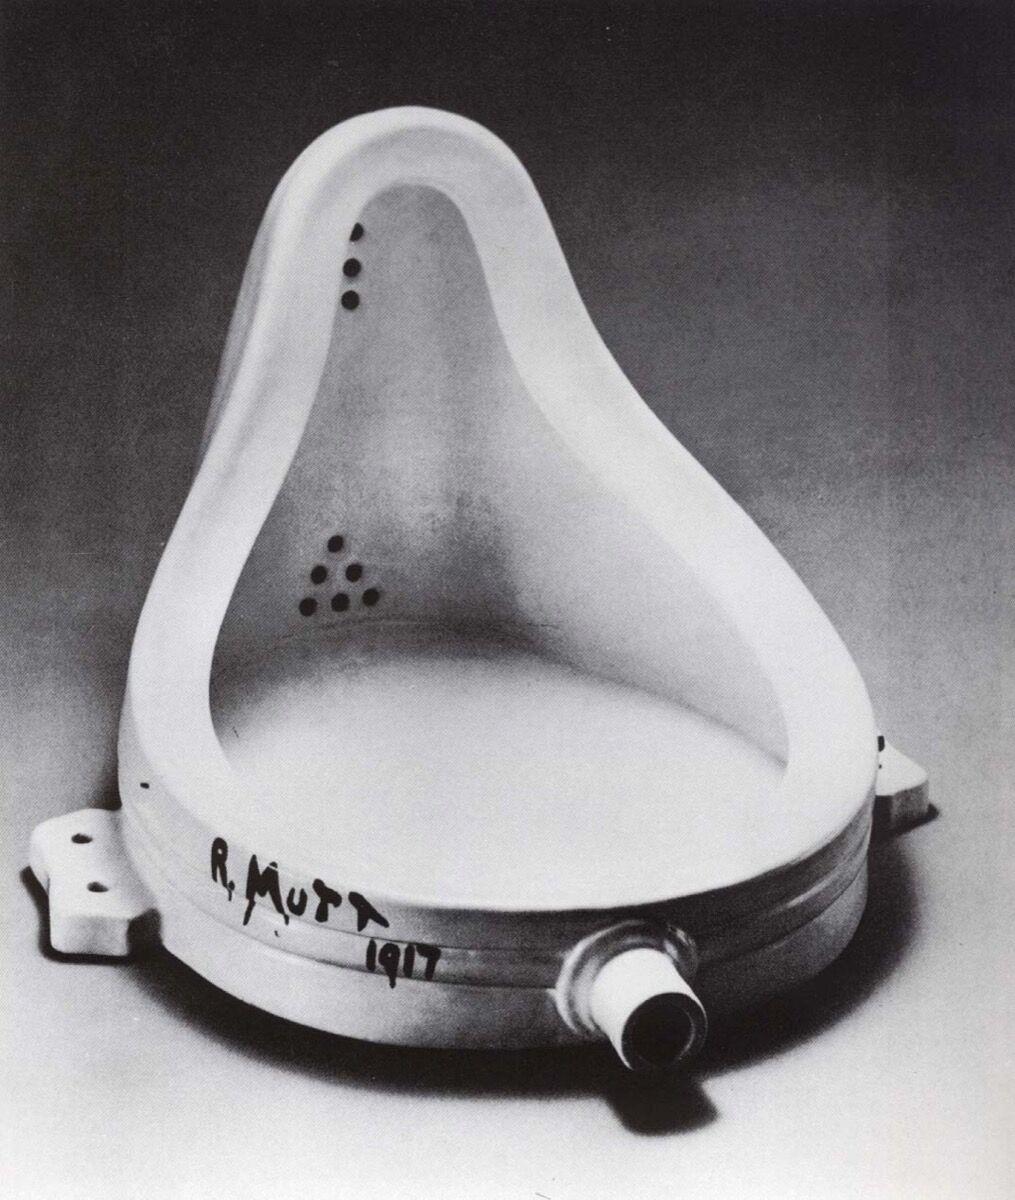 Image of Marcel Duchamp's Fountain, 1917, via Wikimedia Commons.